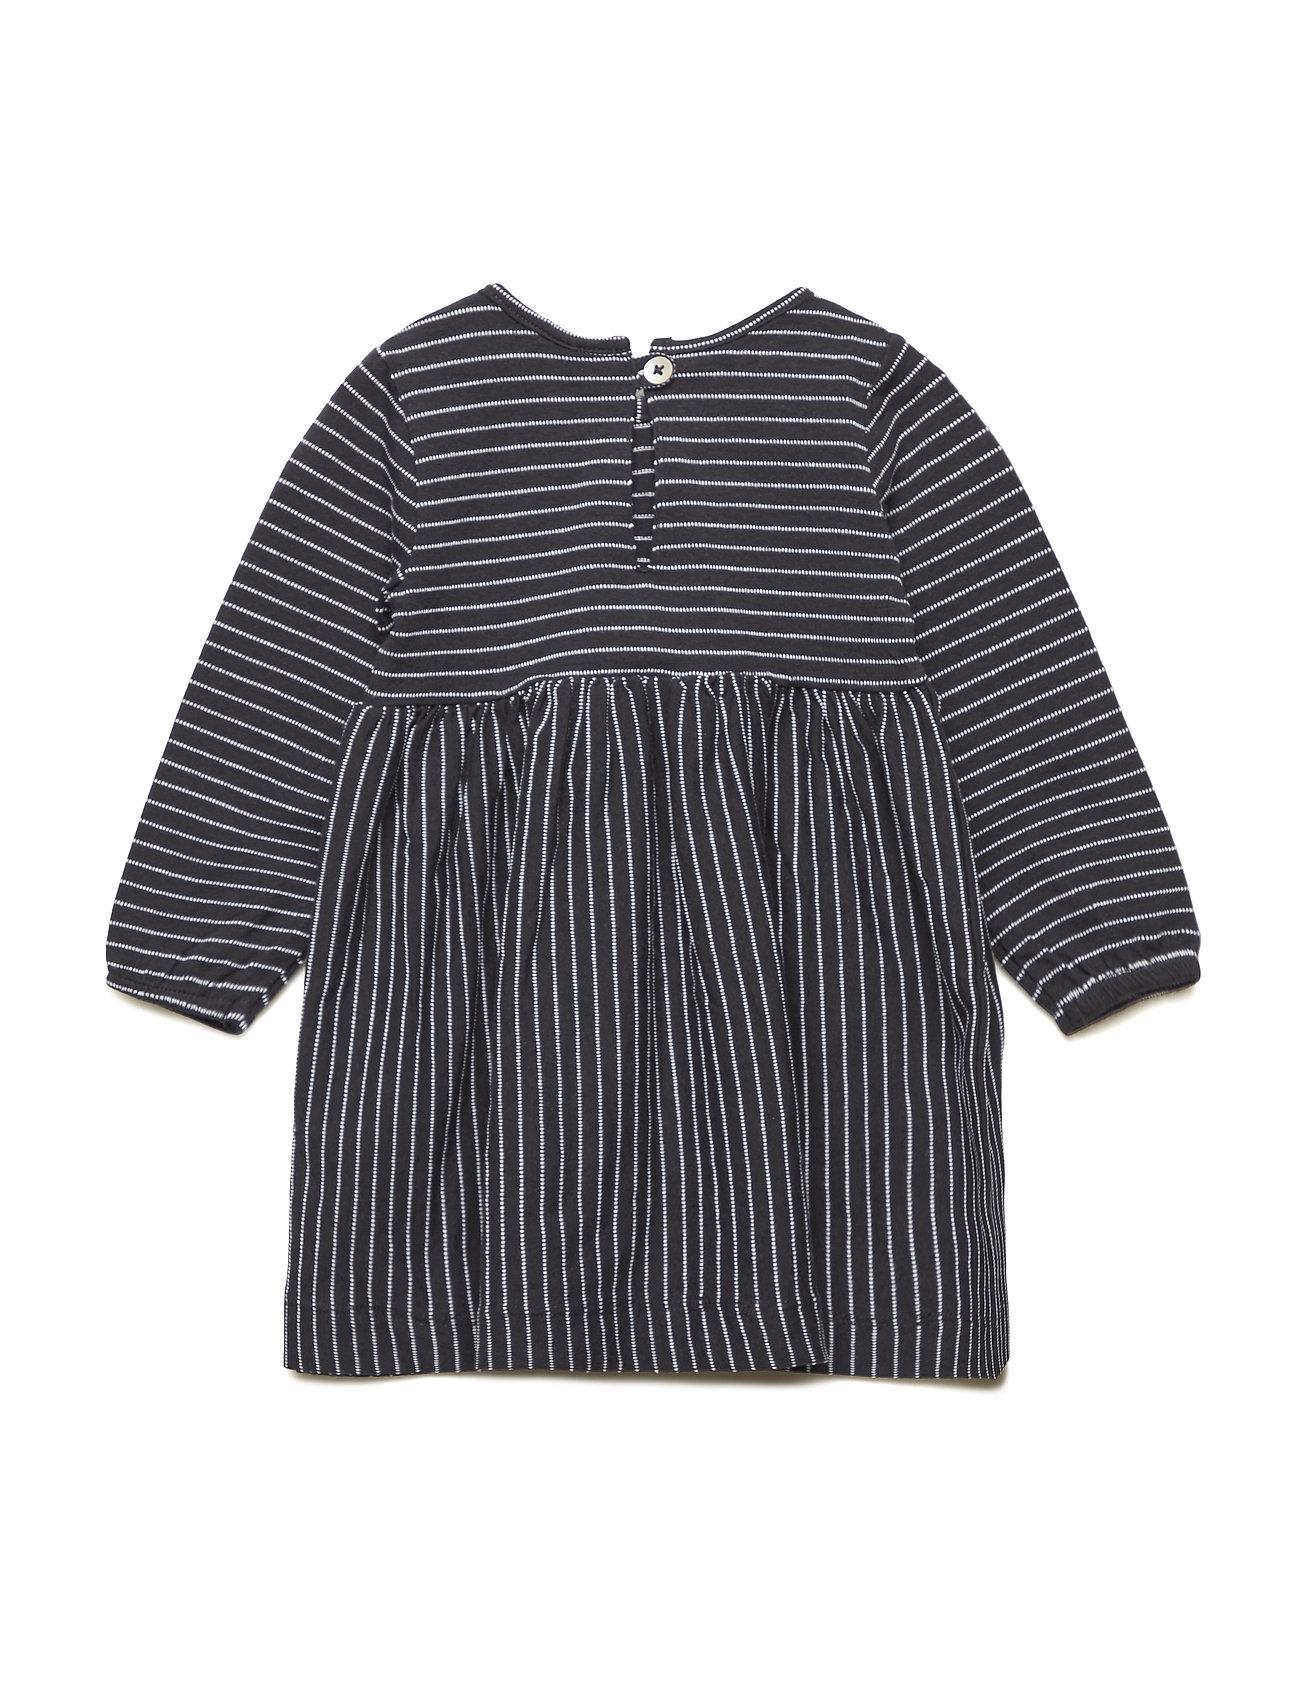 823edec0759 Dress Long Sleeve kjoler fra Noa Noa Miniature til børn i Sort ...